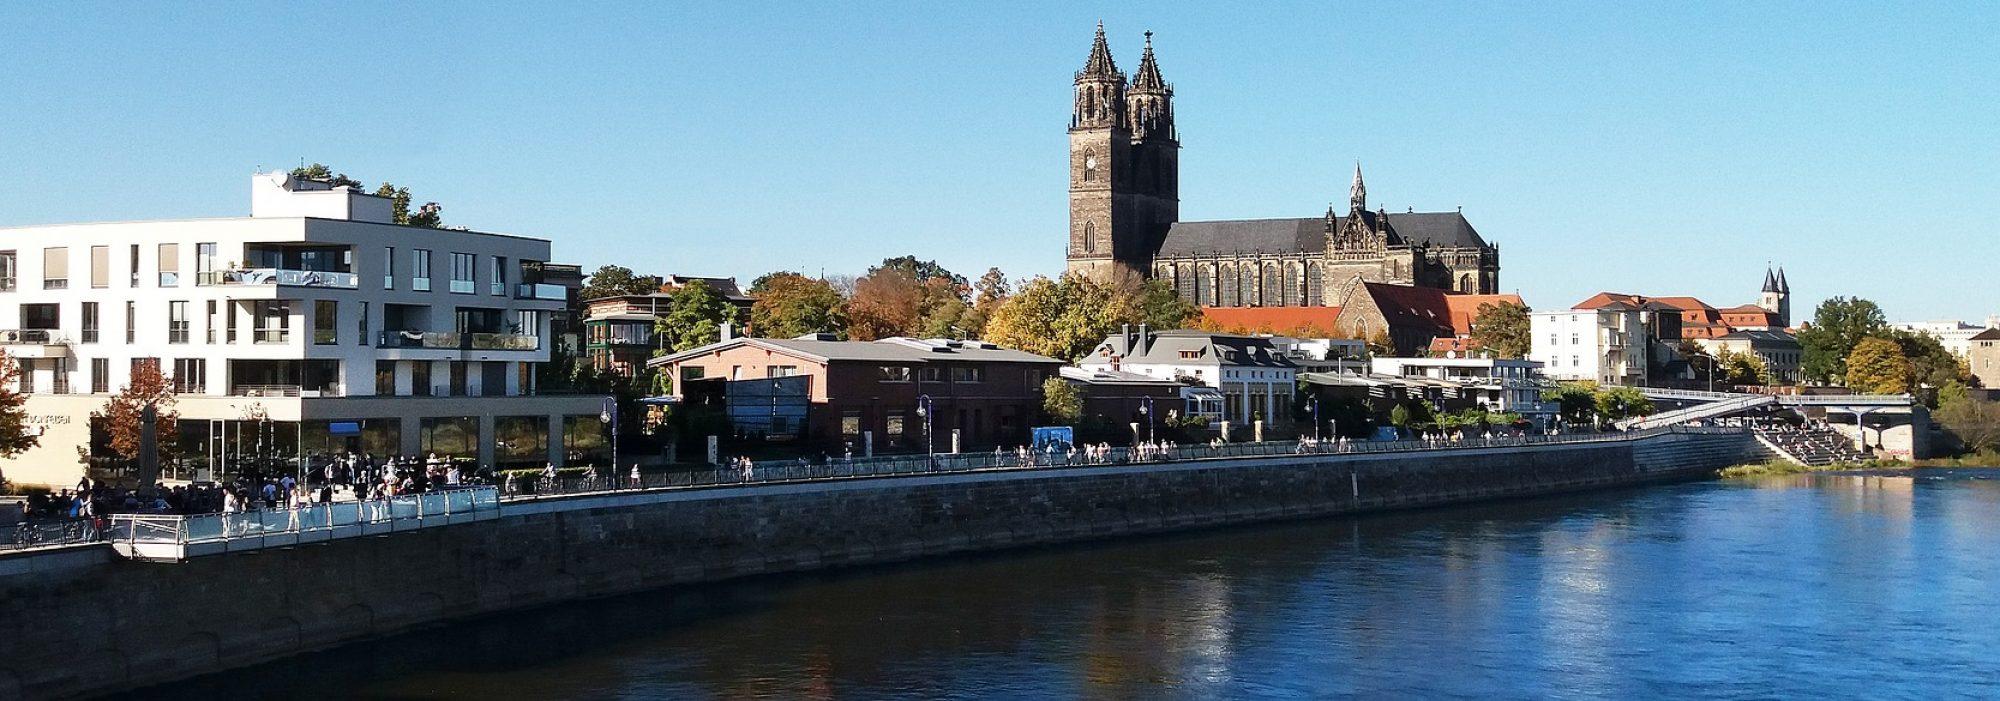 Stadtelternrat Magdeburg